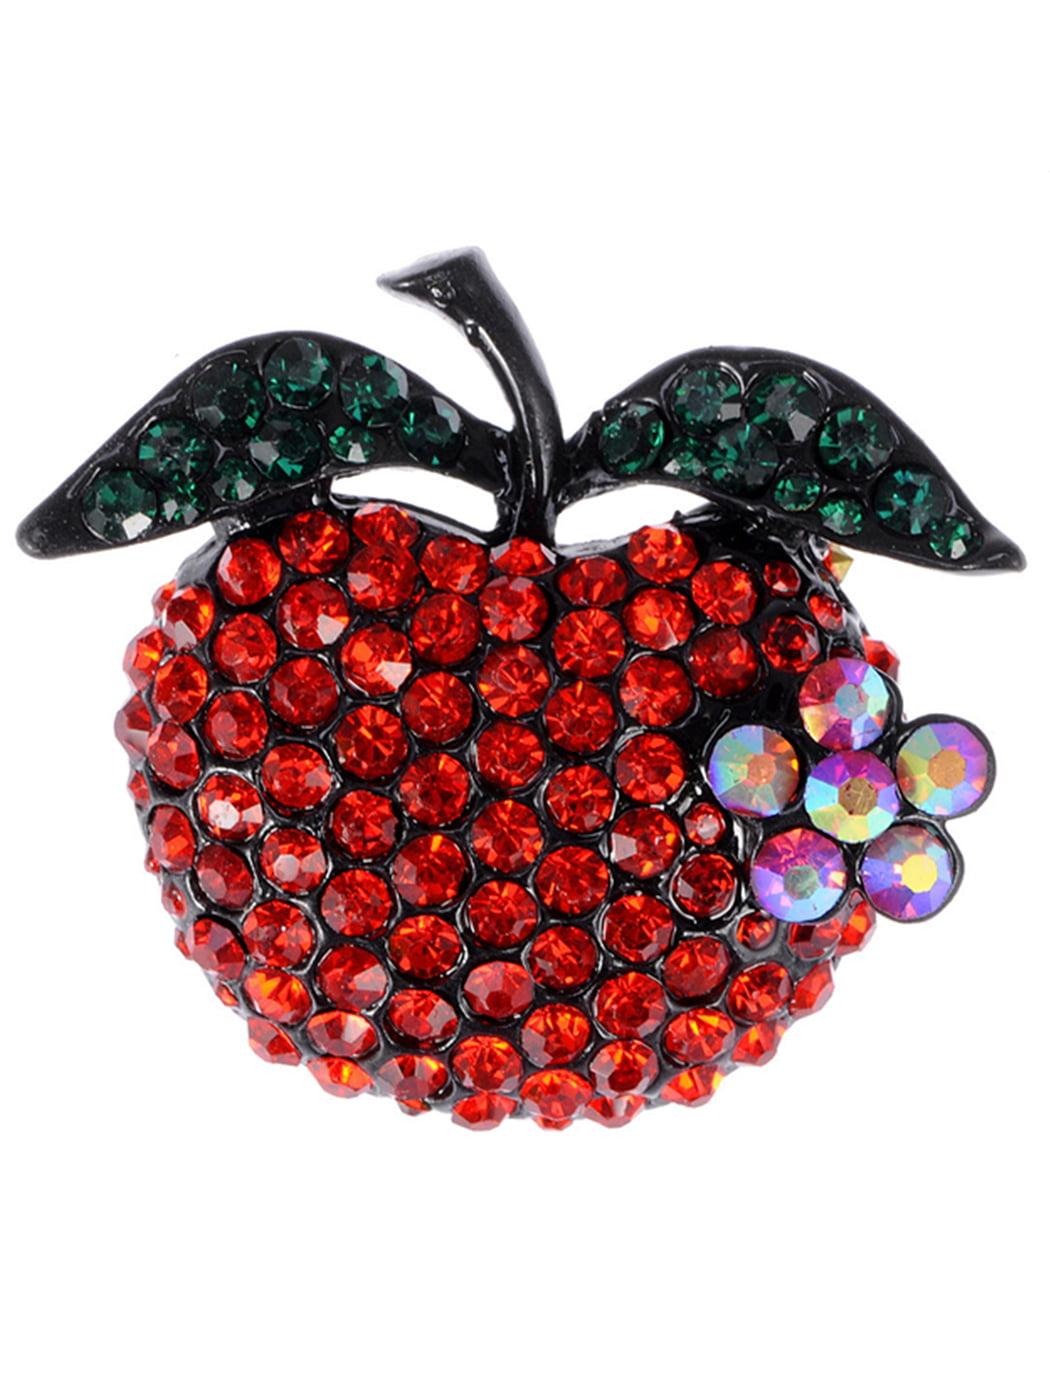 Ruby Red Crystal Rhinestone Emerald Leafy Teacher's Pet Apple Fruit Pin Brooch by